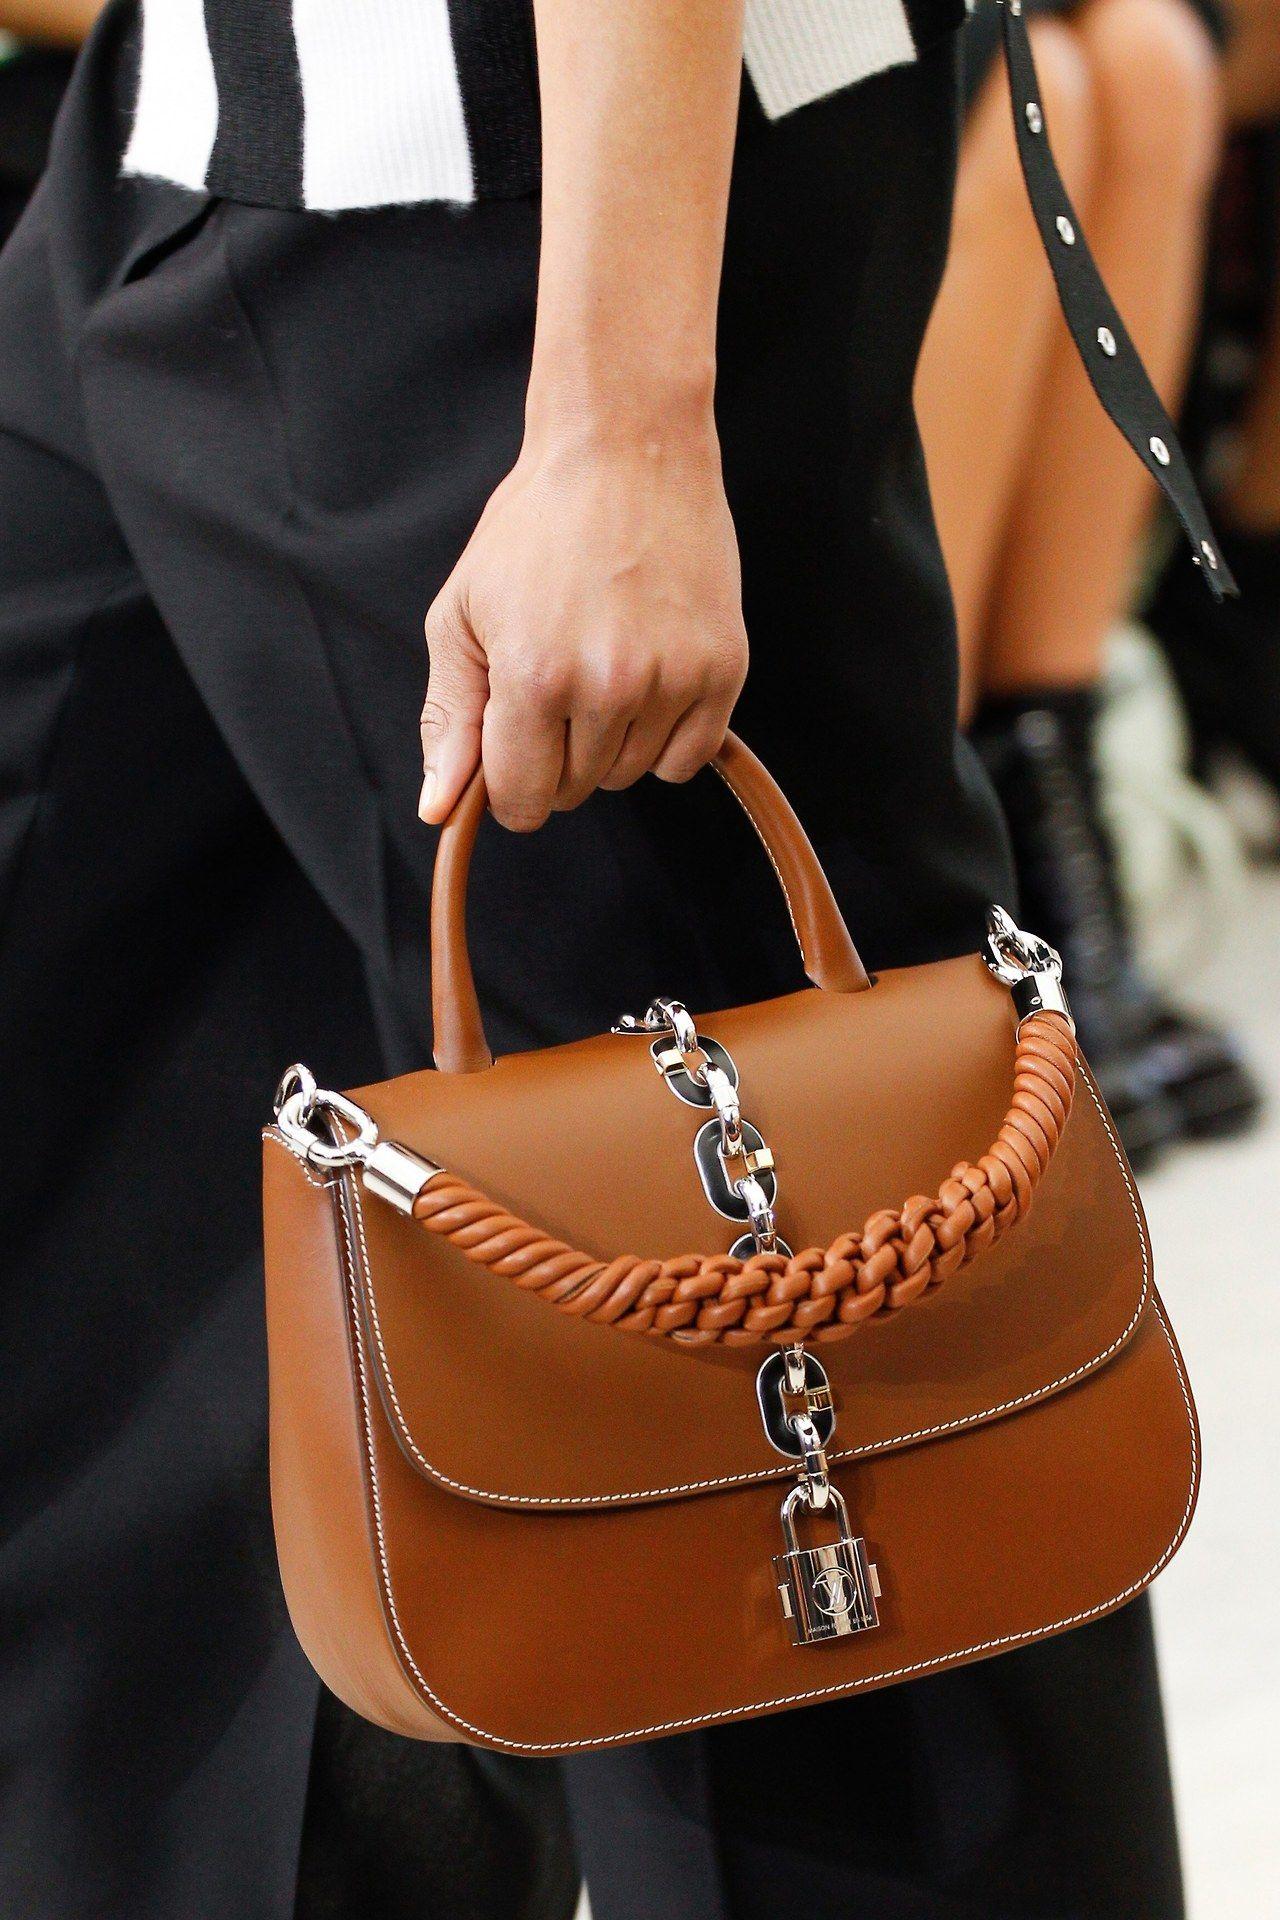 louis vuitton 2017 spring summer top handle handbags series 6